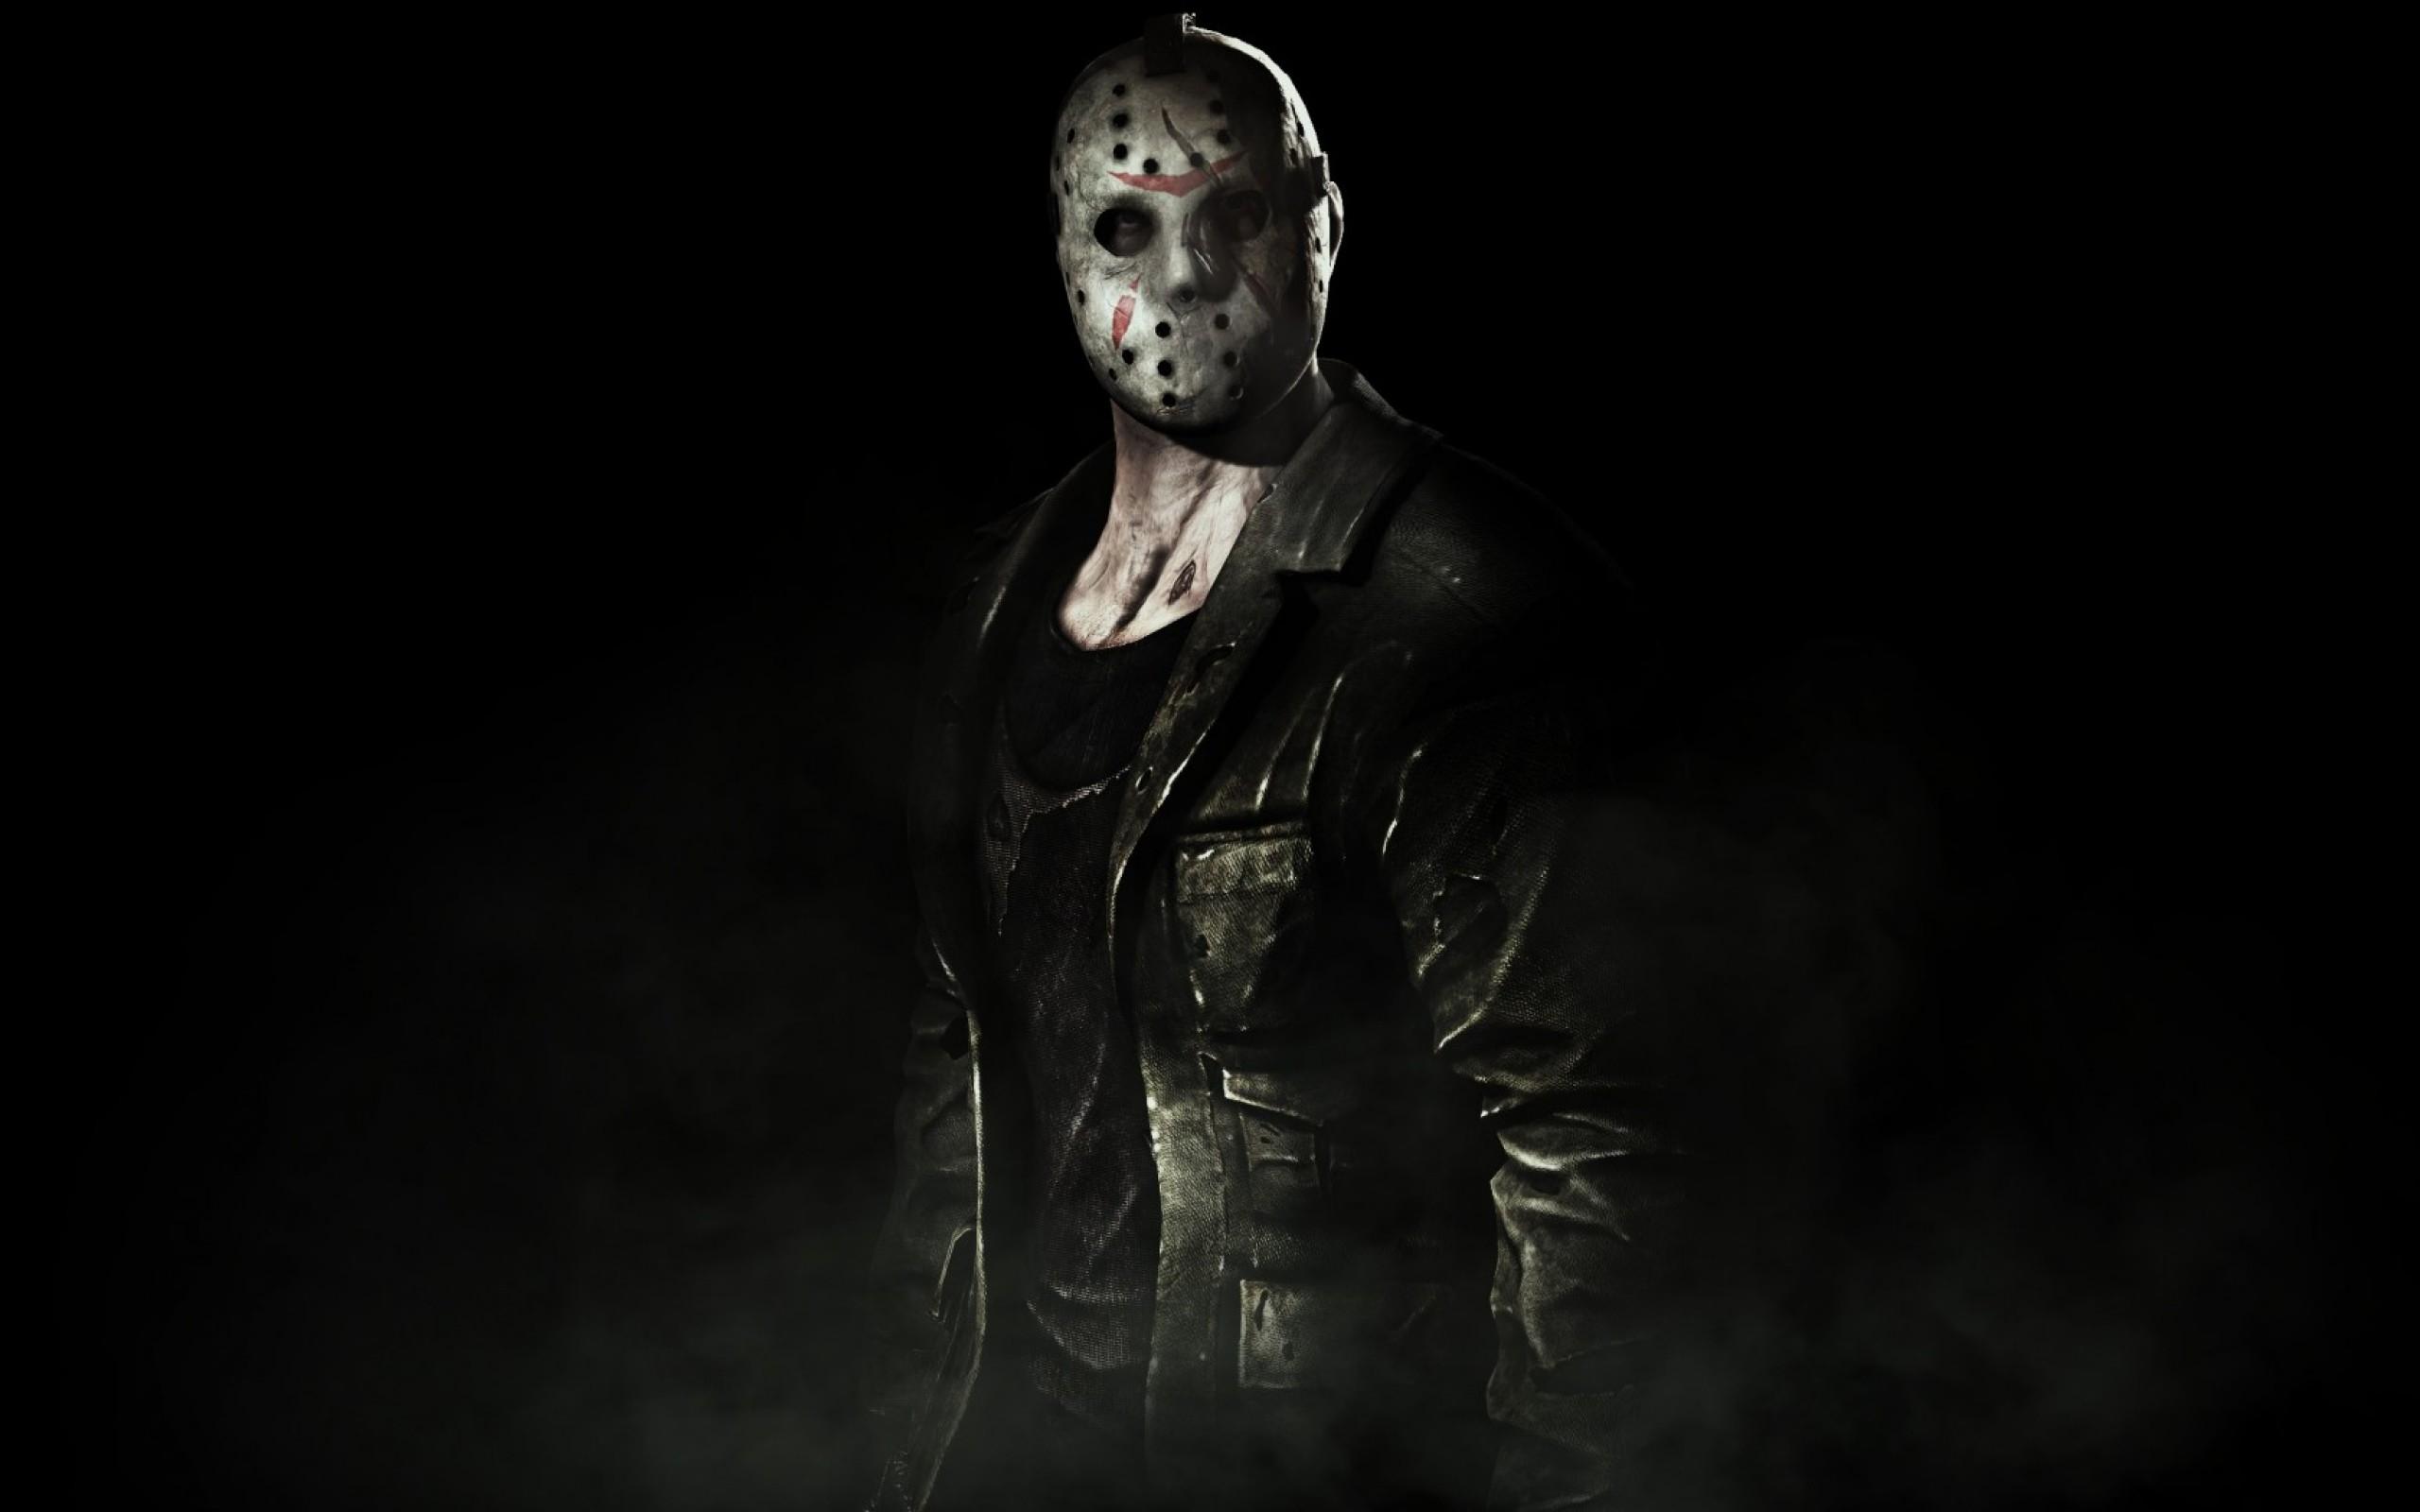 Mortal-Kombat-X-Scorpion-Game-Voorhins-Character-Mask-Black-Jacket-WallpapersByte-com-2560×1600.jpg  (2560×1600) | MORTAL KOMBAT. | Pinterest | Mortal kombat …